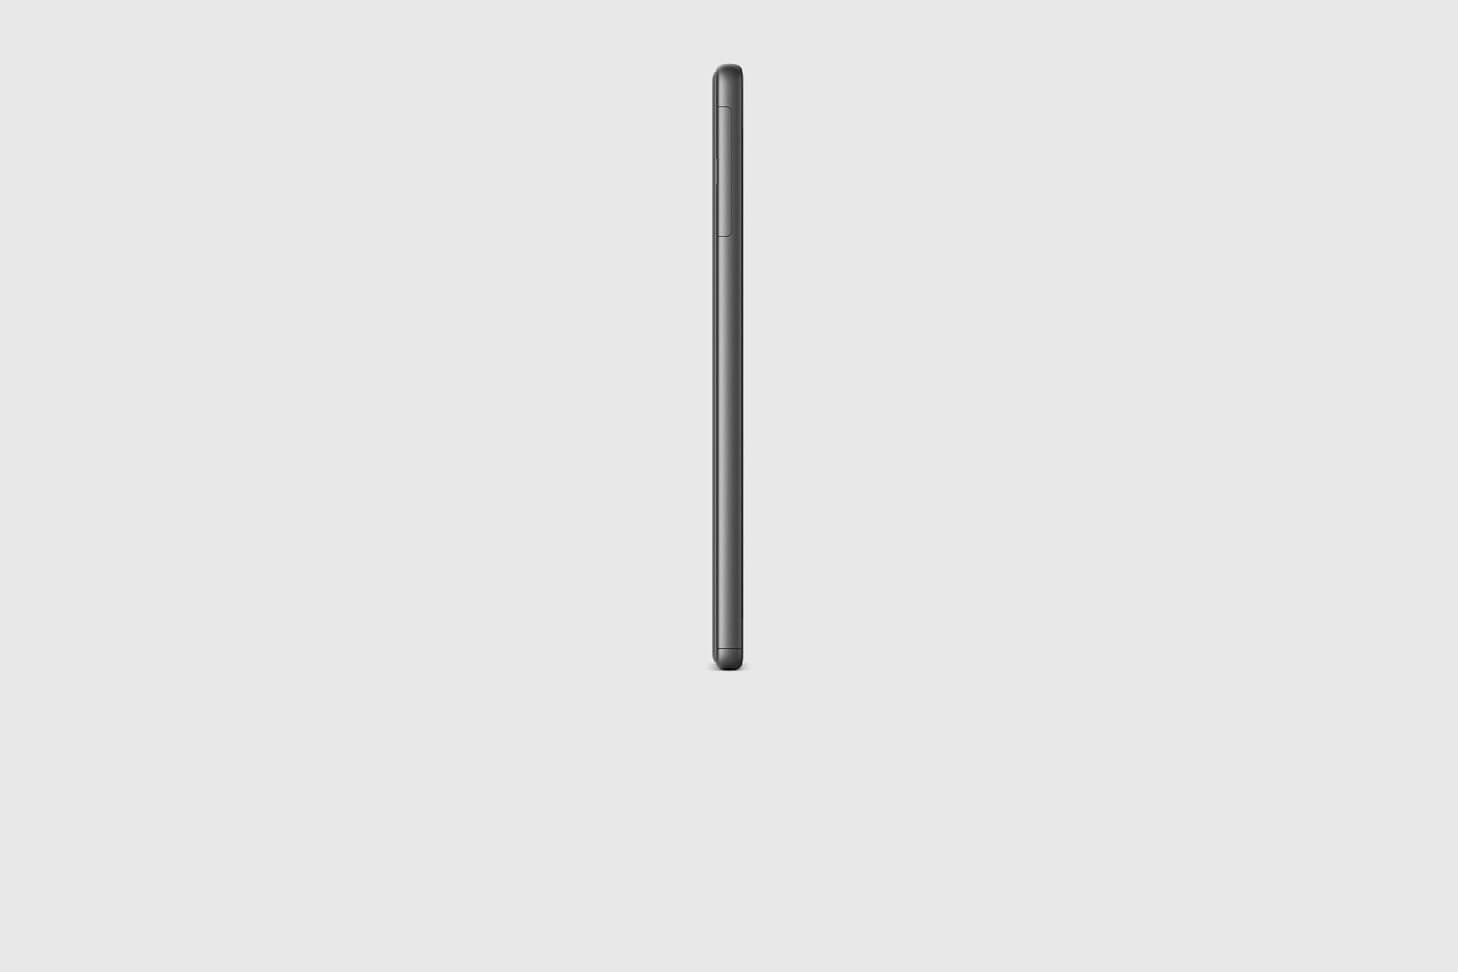 smt sony xperia xa ultra p05 - Sony apresenta Xperia XA Ultra, seu phablet bom de selfie